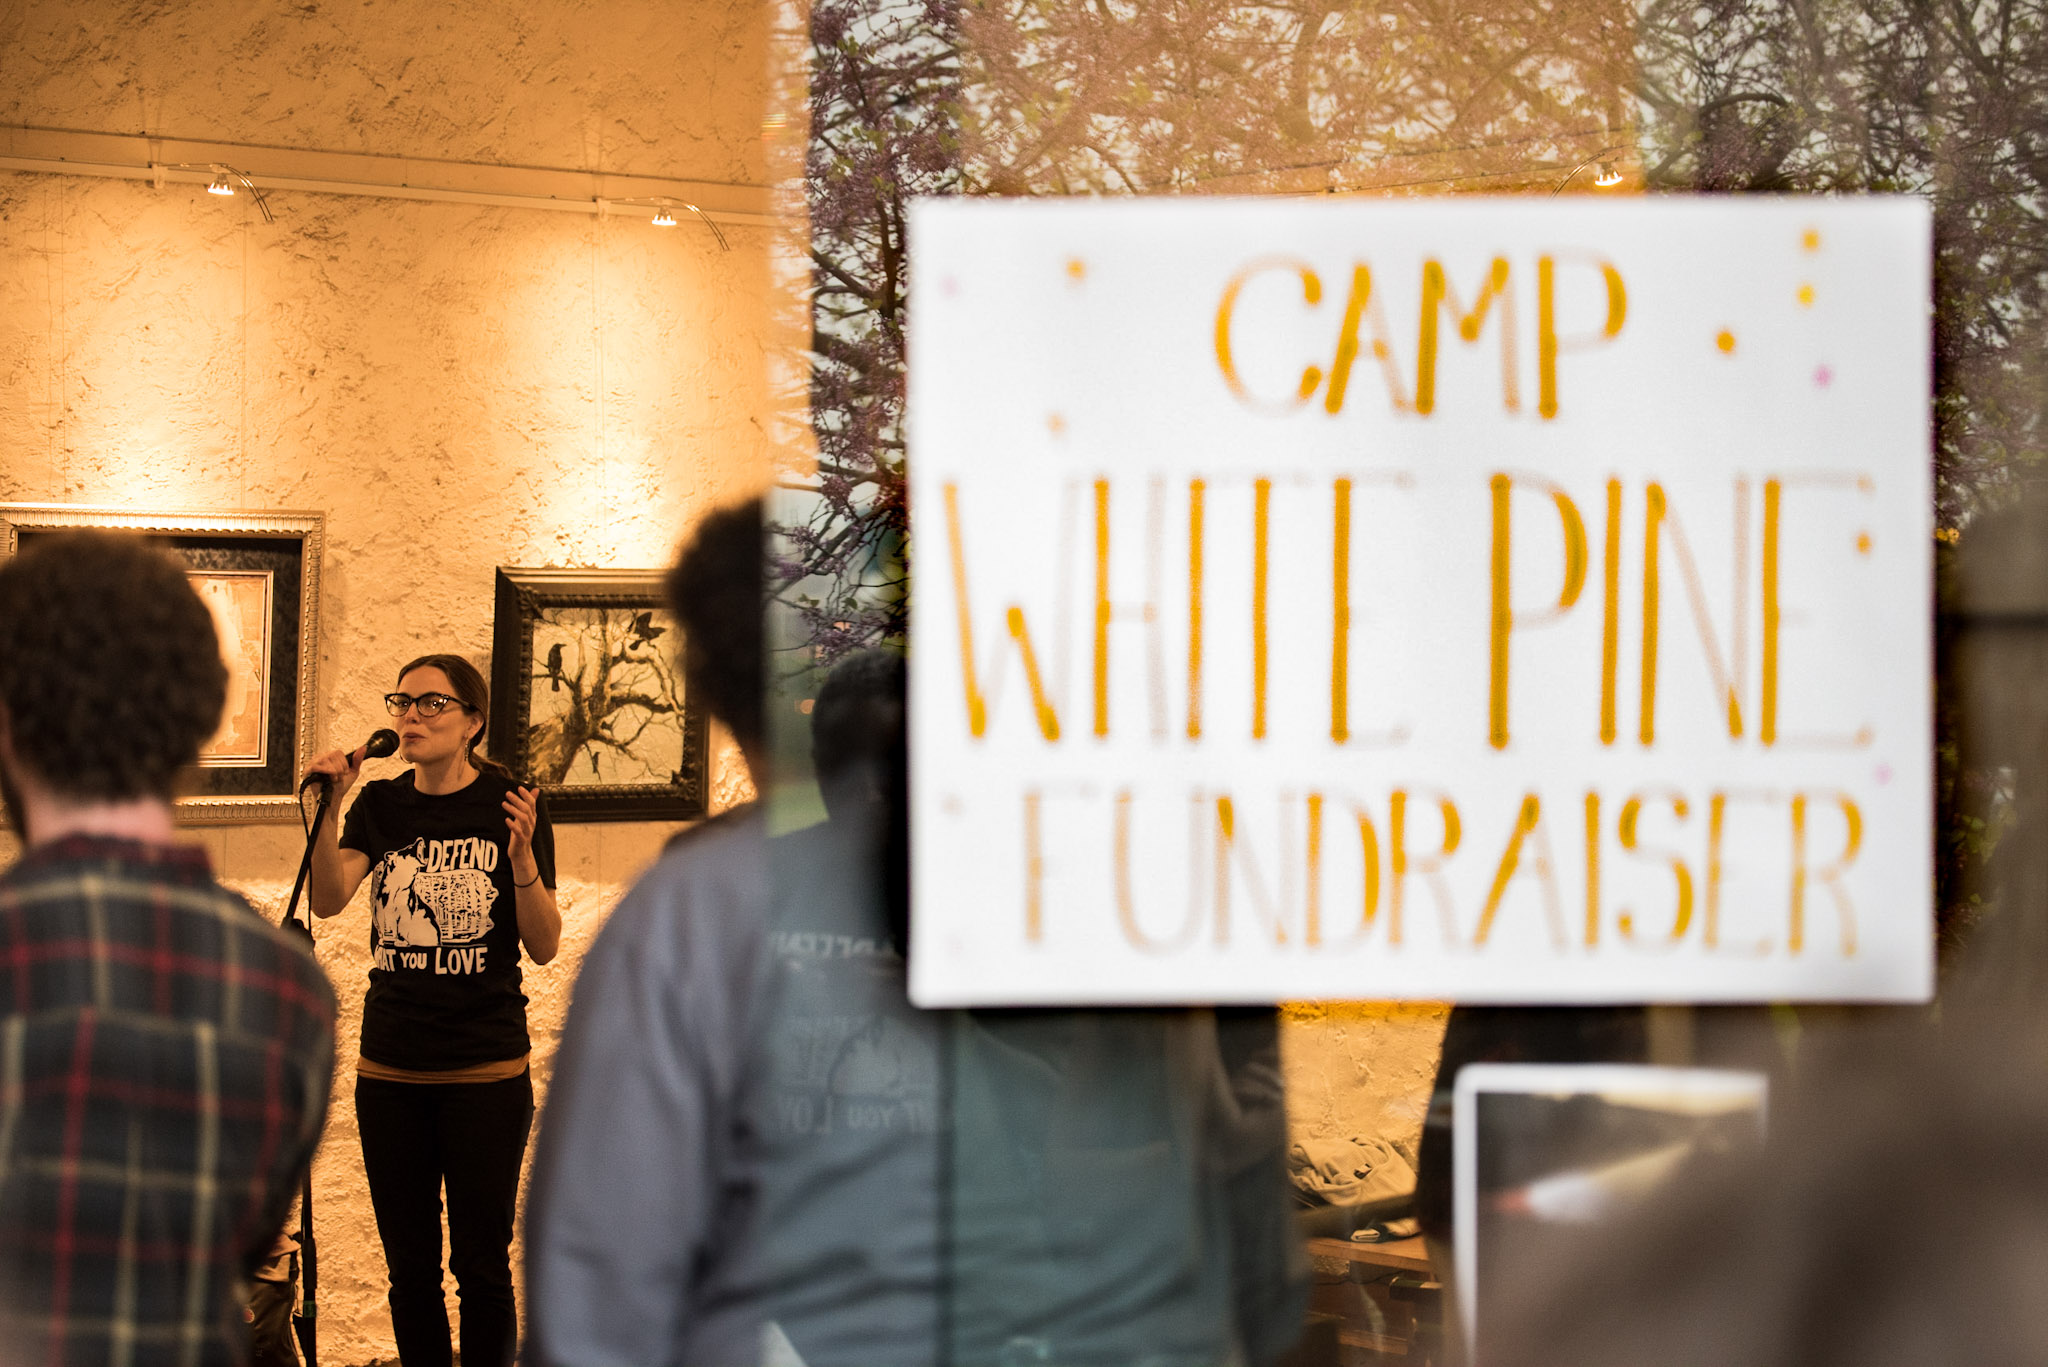 EDGE Camp White Pine Fundraiser